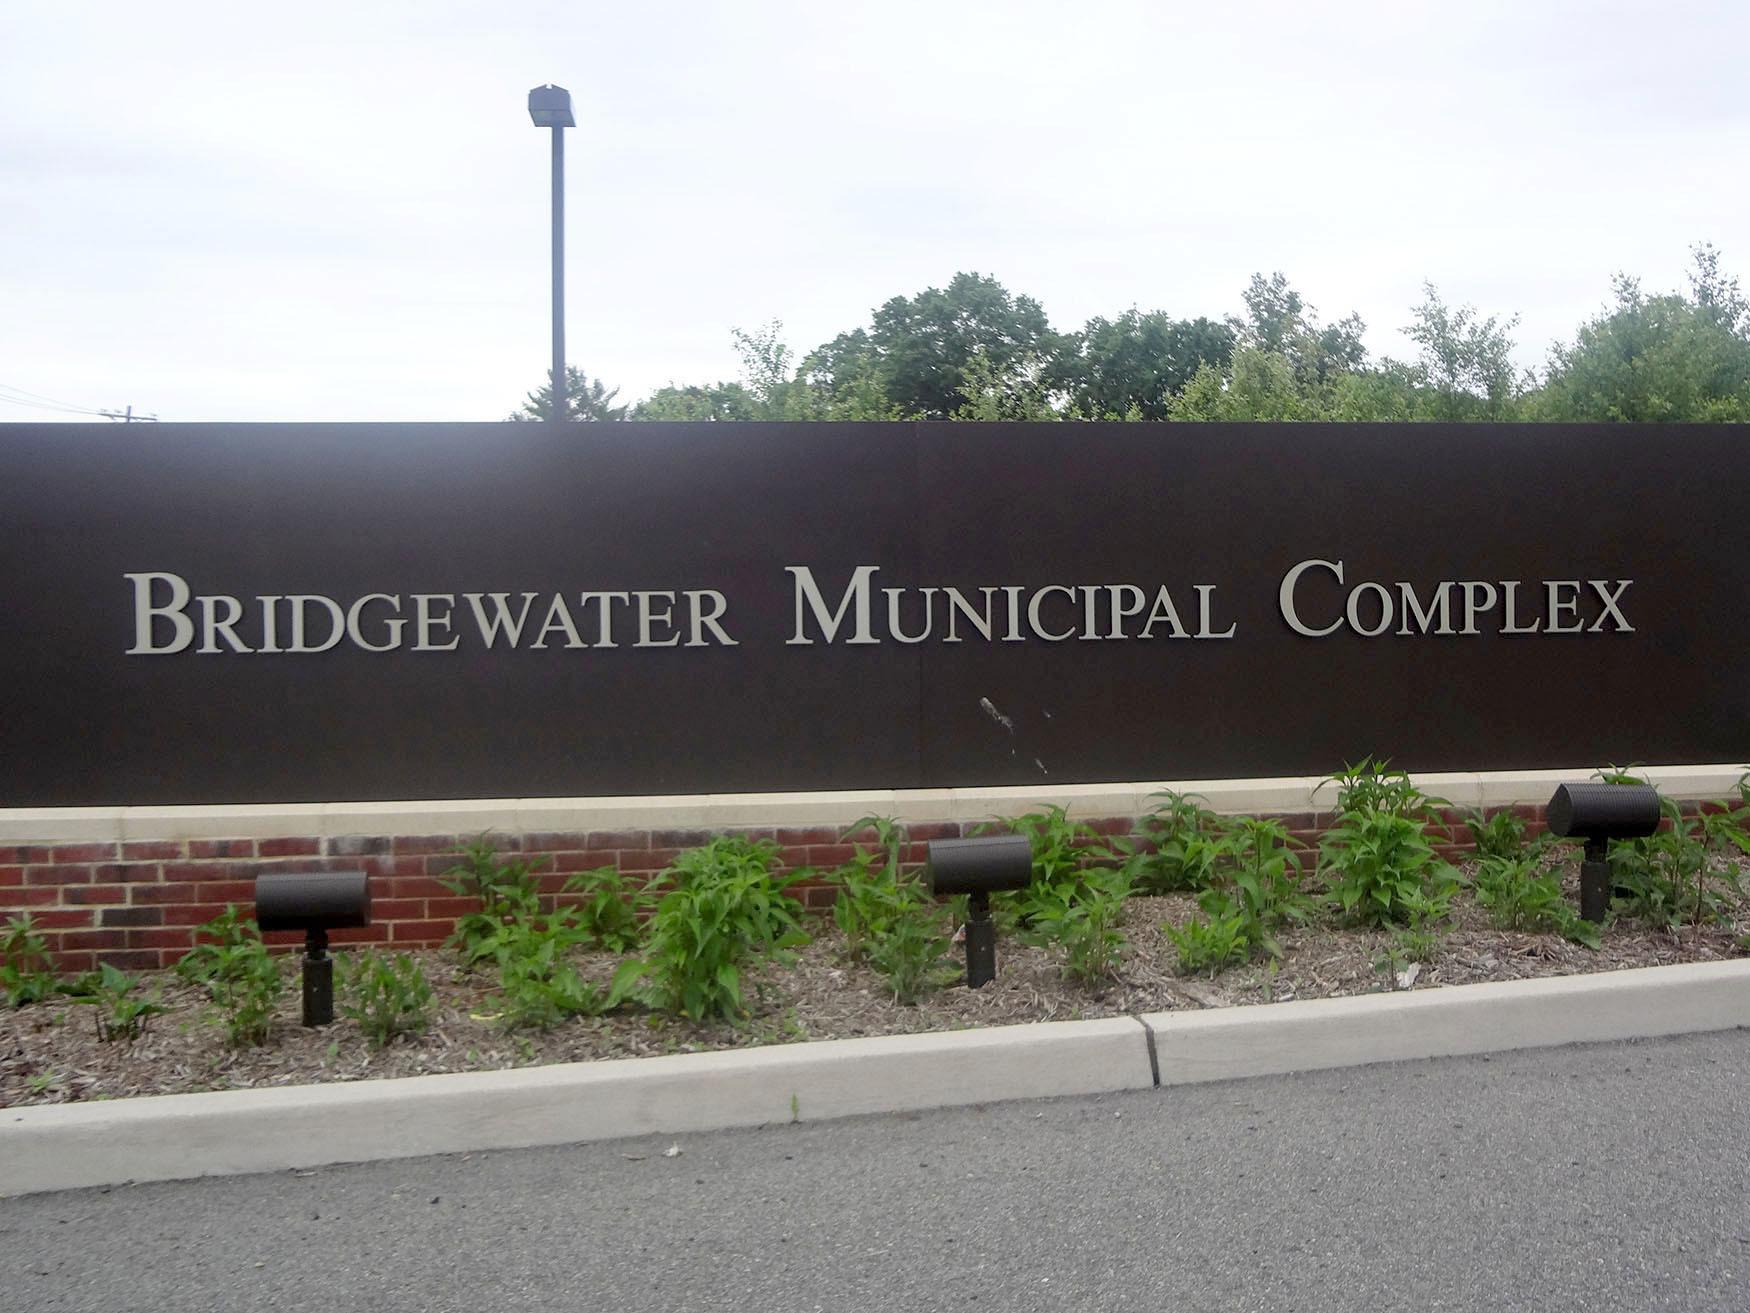 6e03a64ff8f0e2599e0b_Bridgewater_municipal.jpg